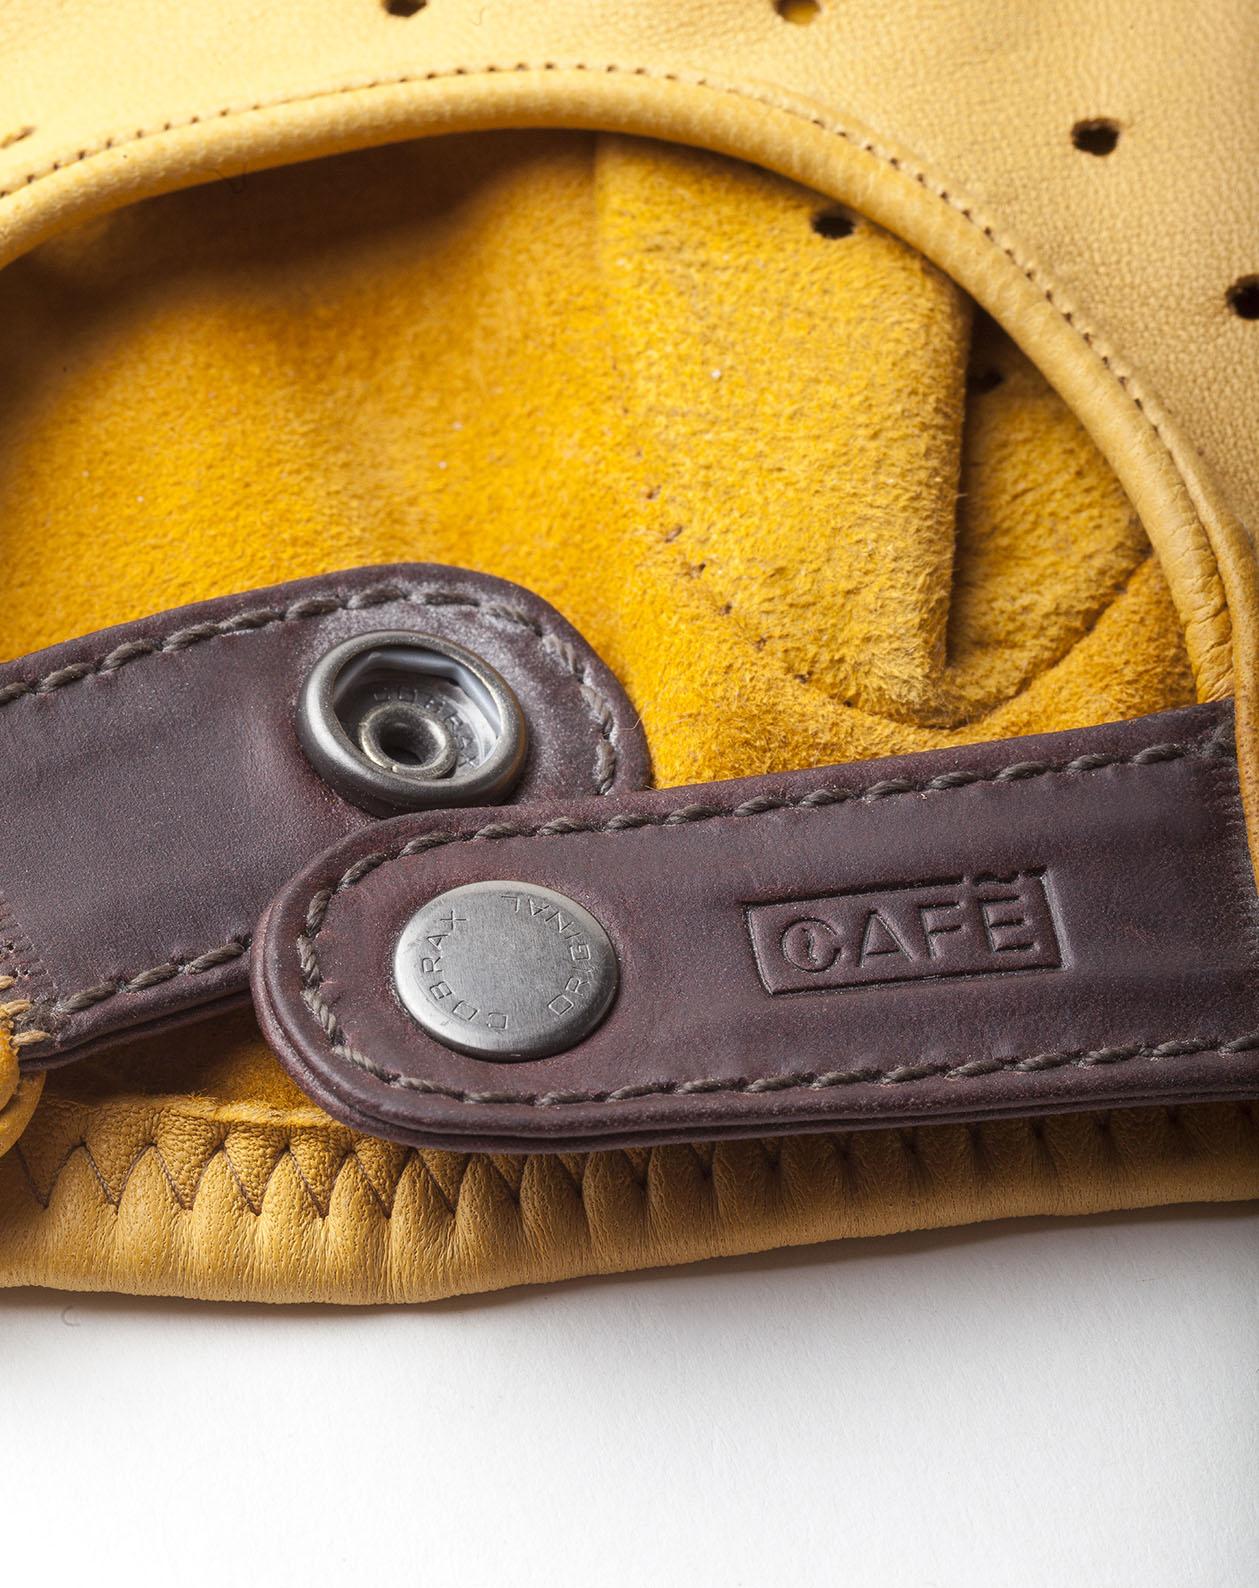 leather-driving-gloves-triton-cream-